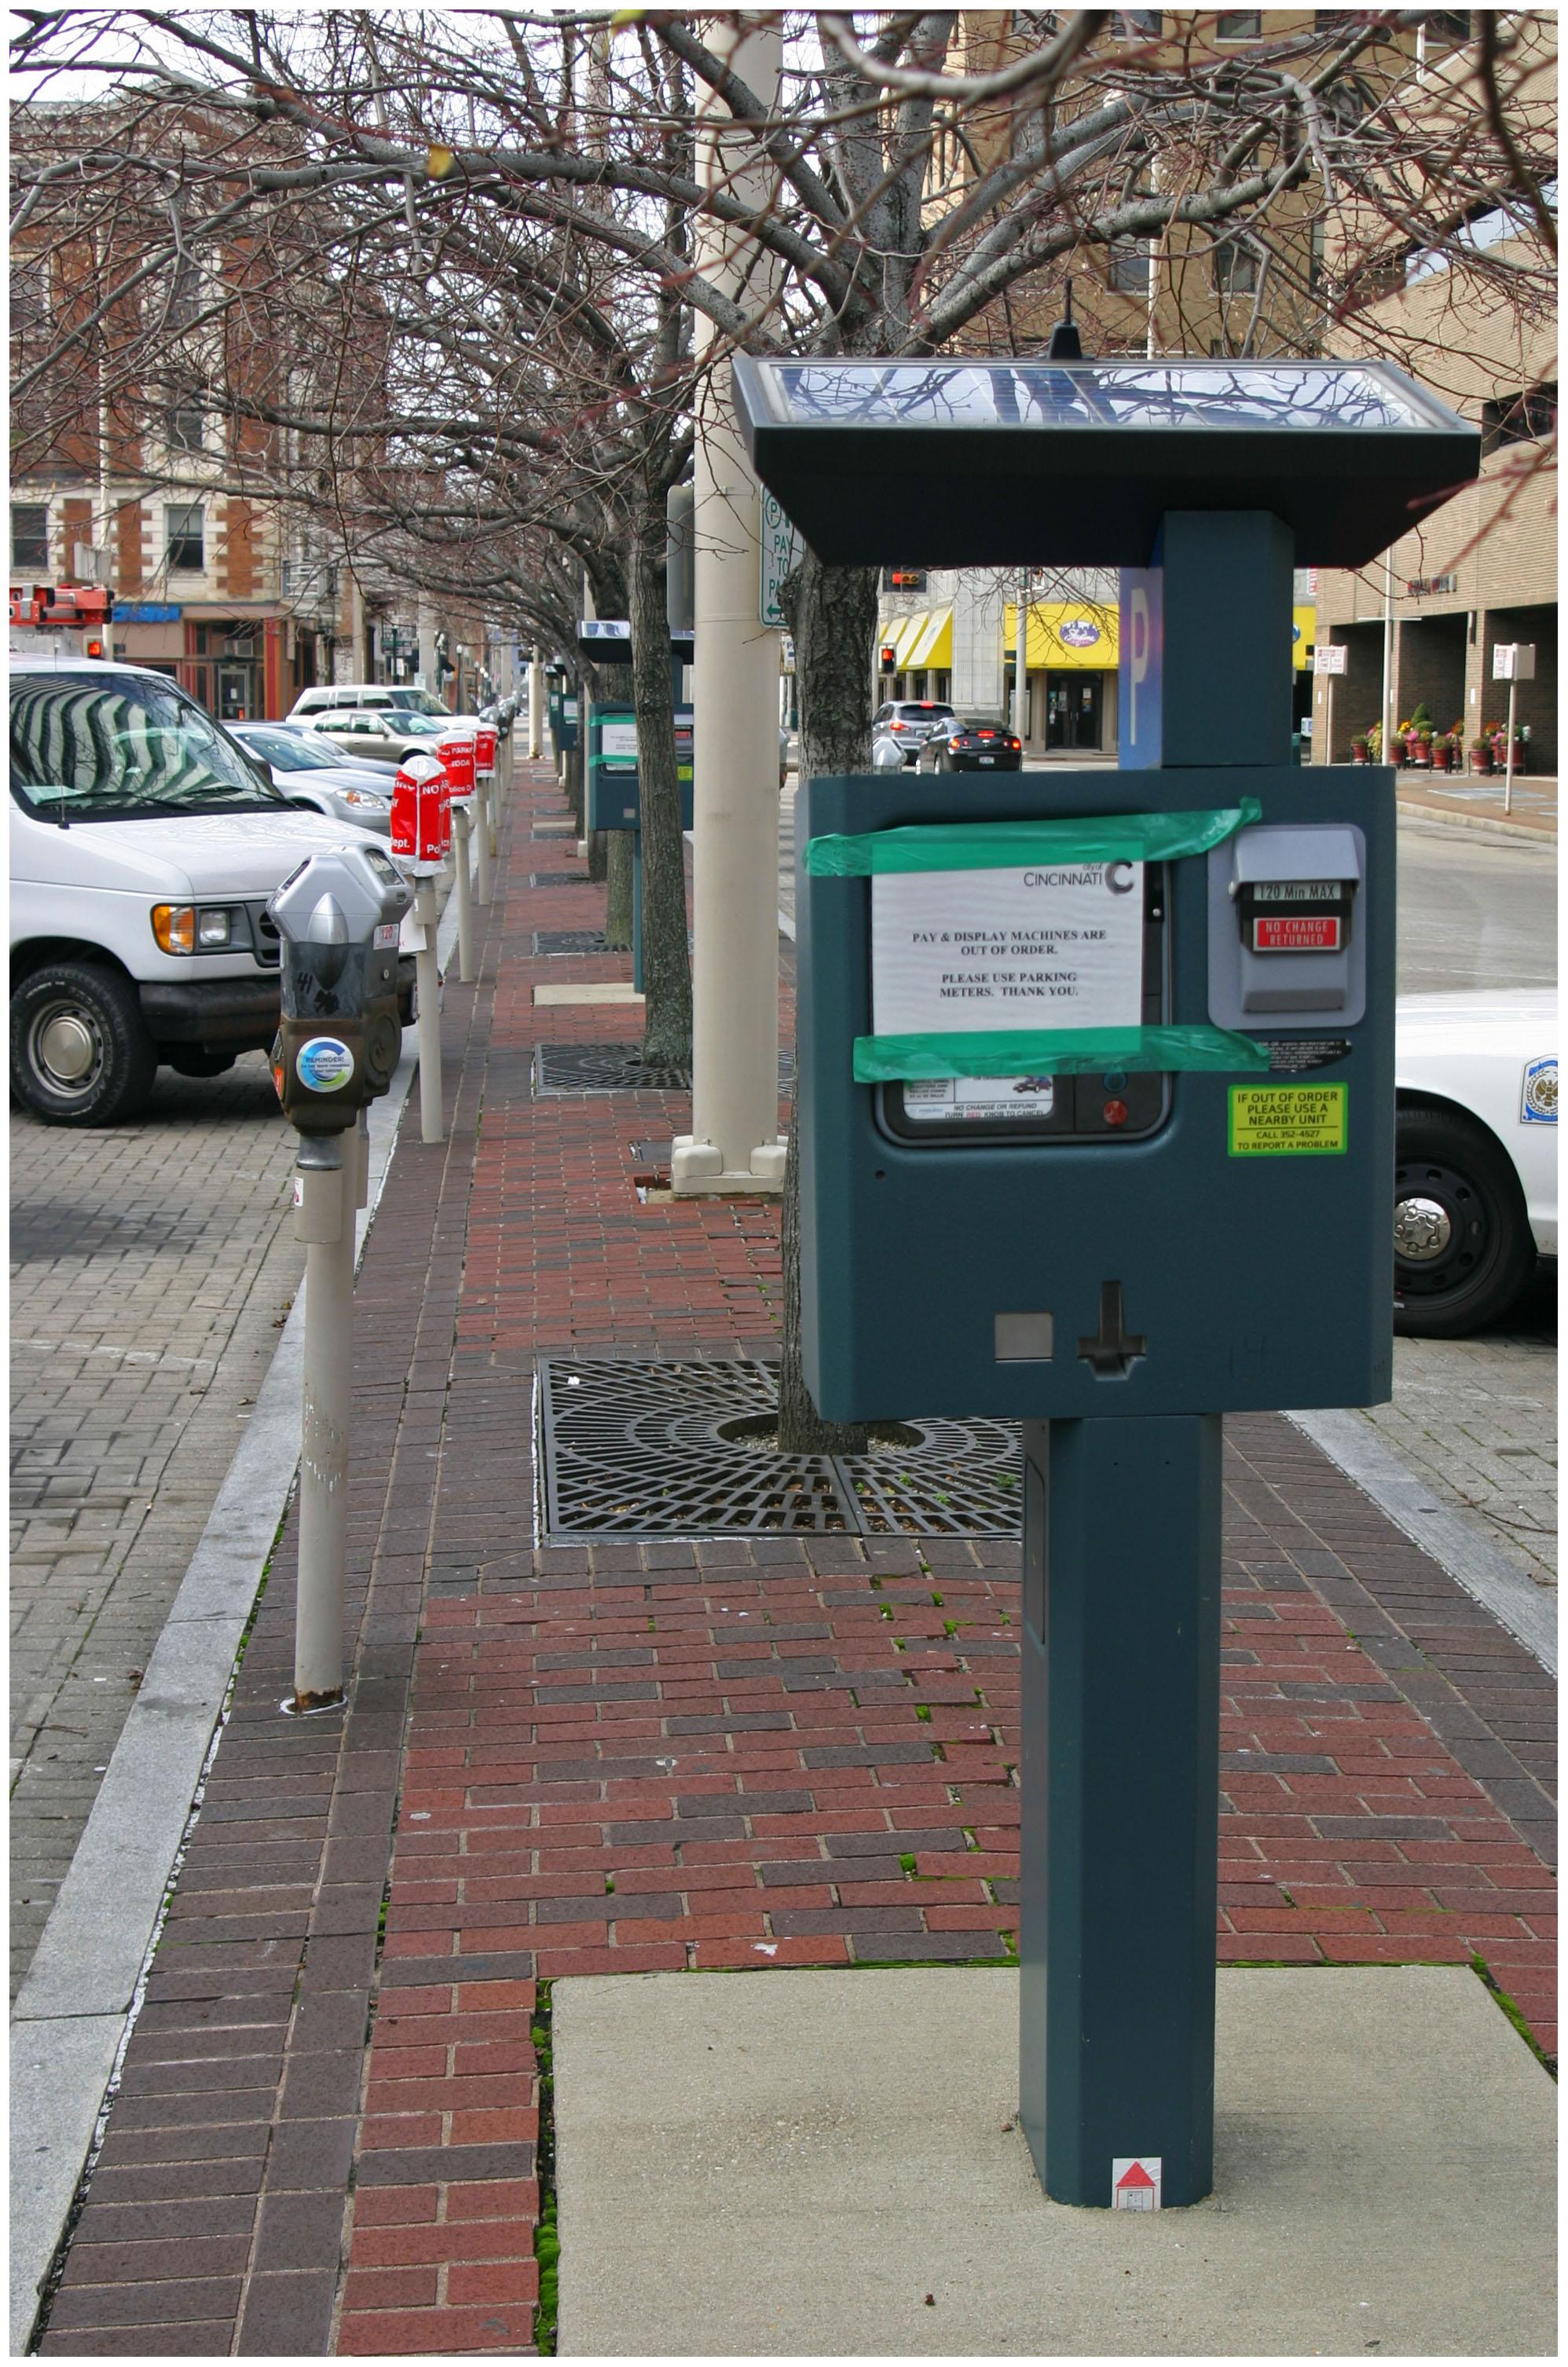 Cincinnati Parking Meter